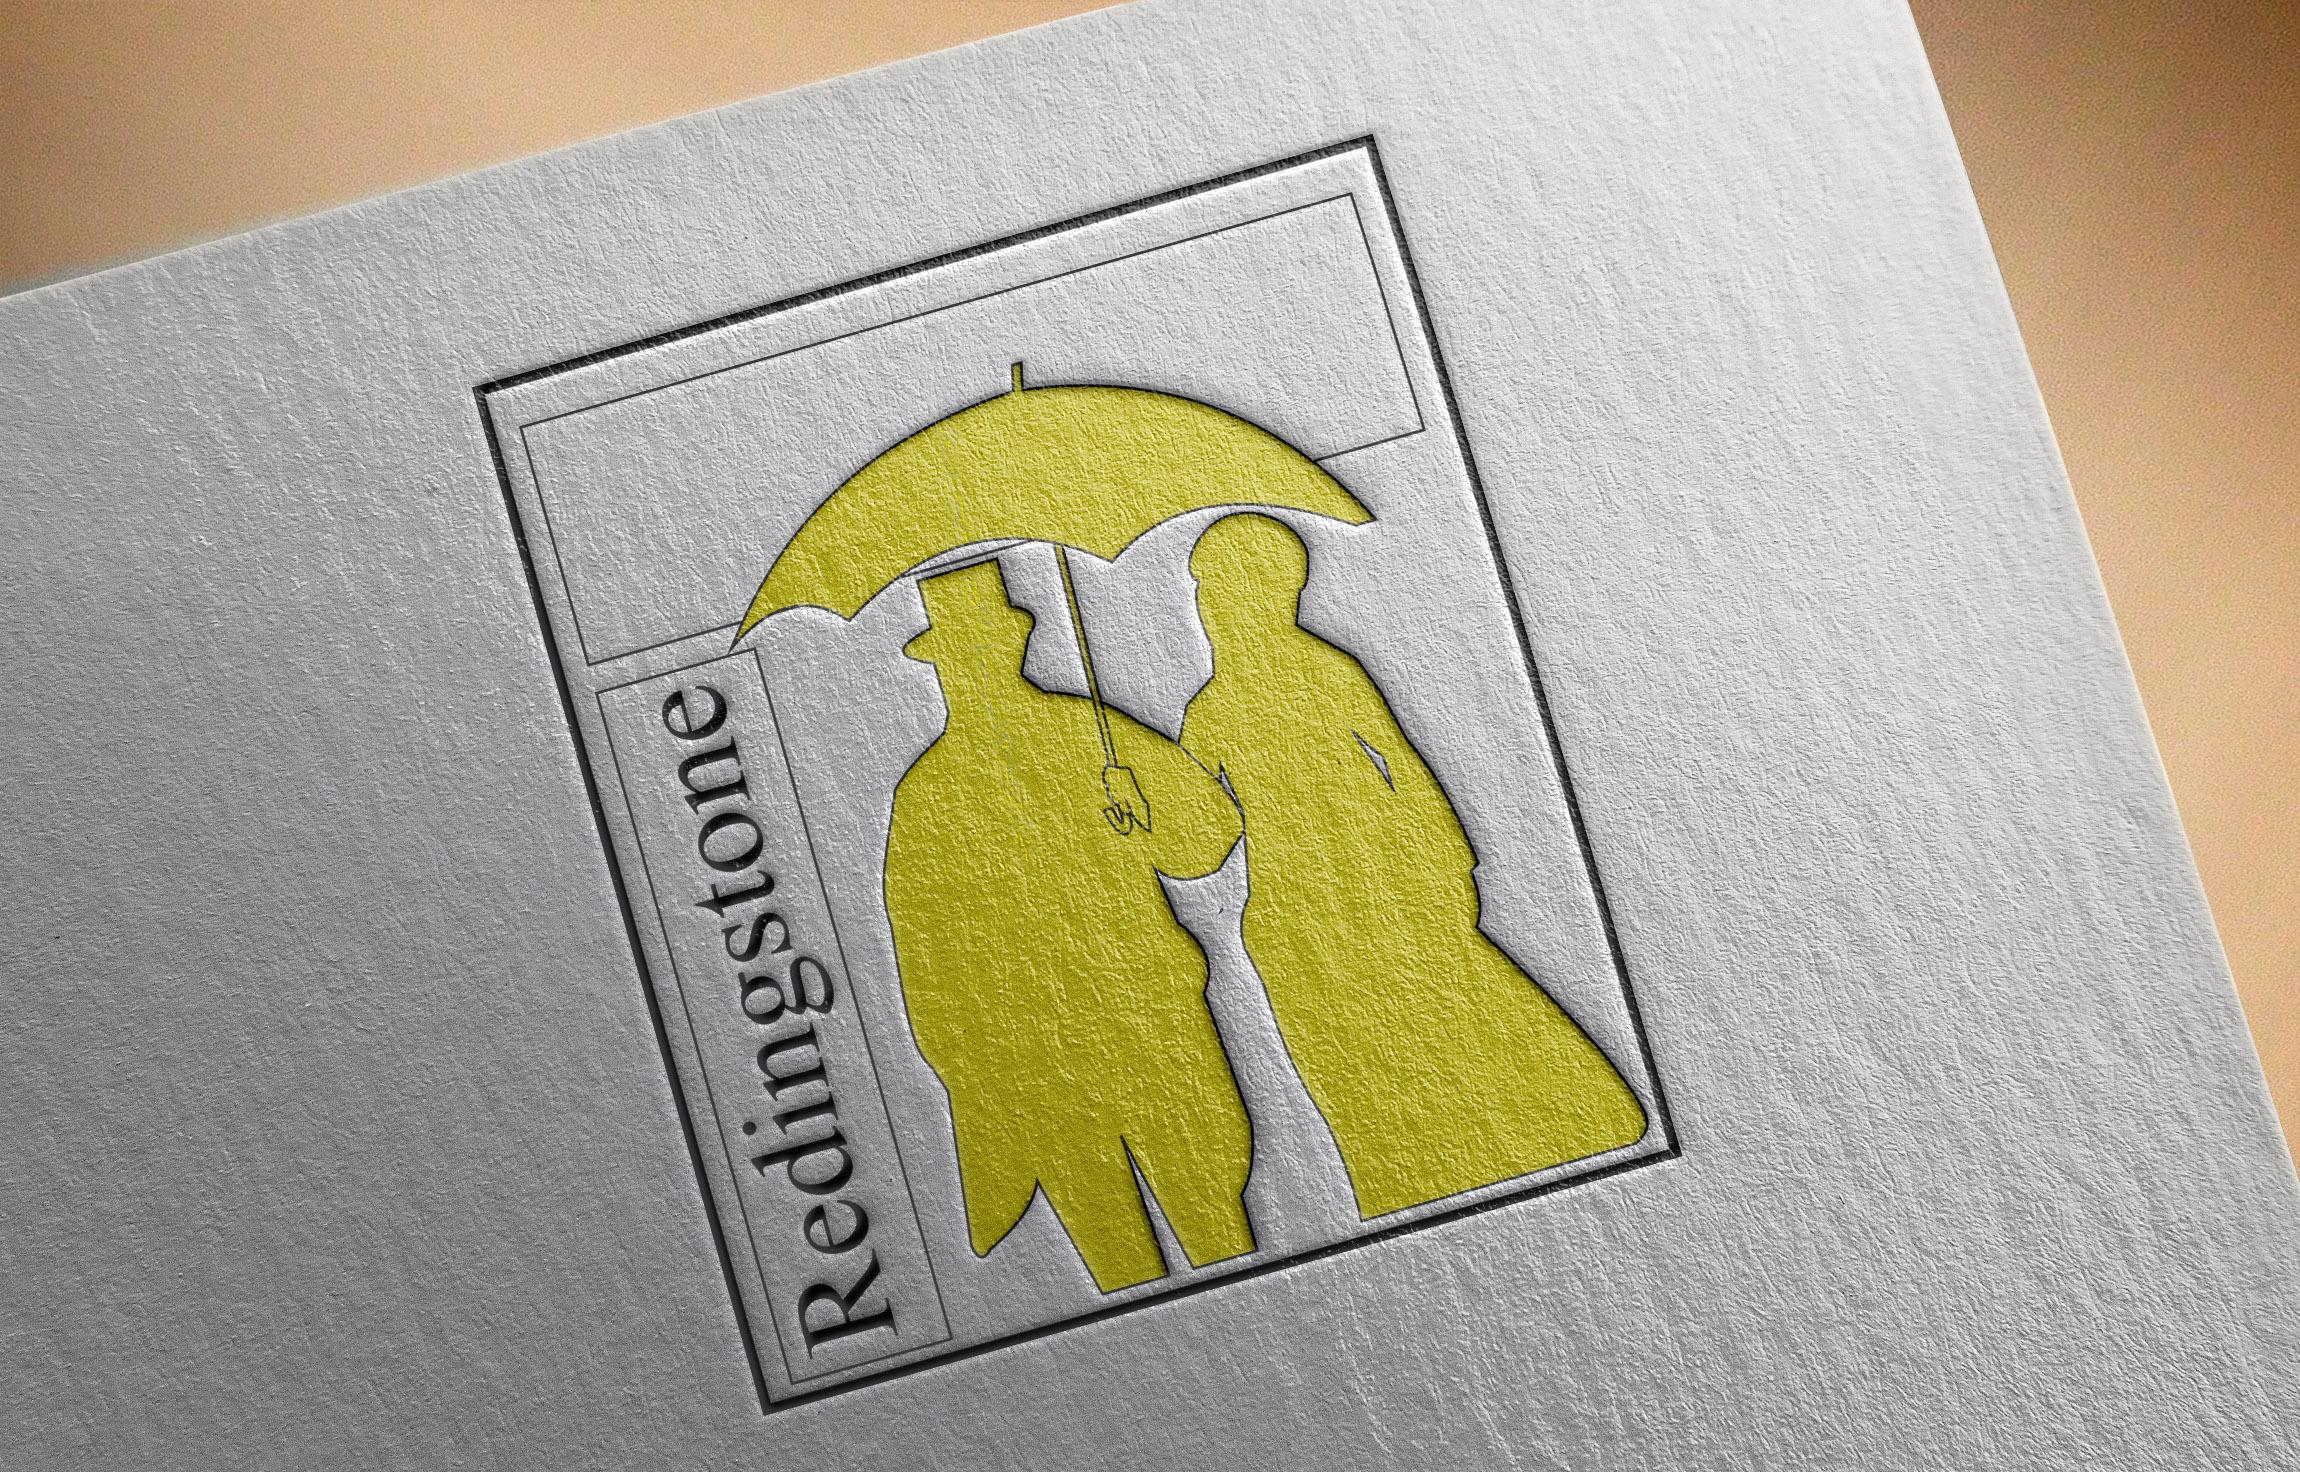 Создание логотипа для компании Redington фото f_95759ba772794652.jpg